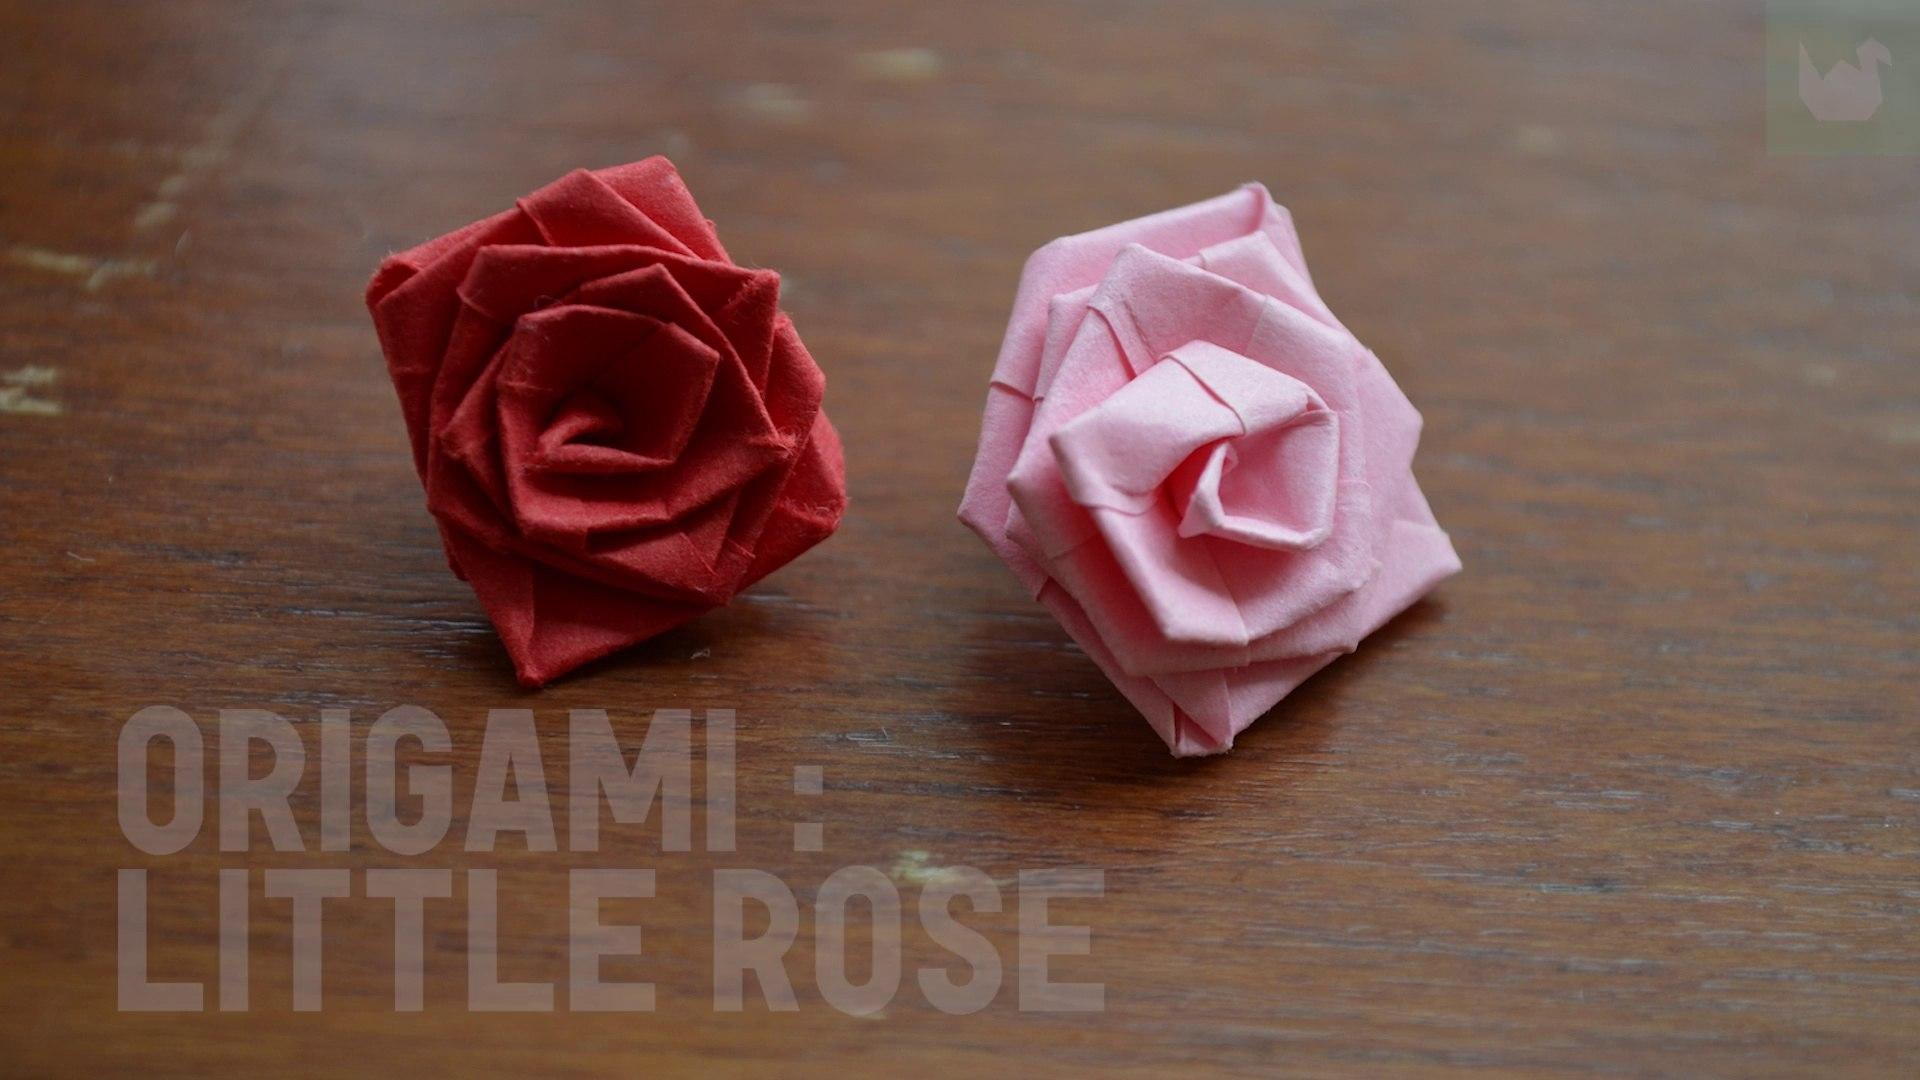 Origami videos - dailymotion | 1080x1920